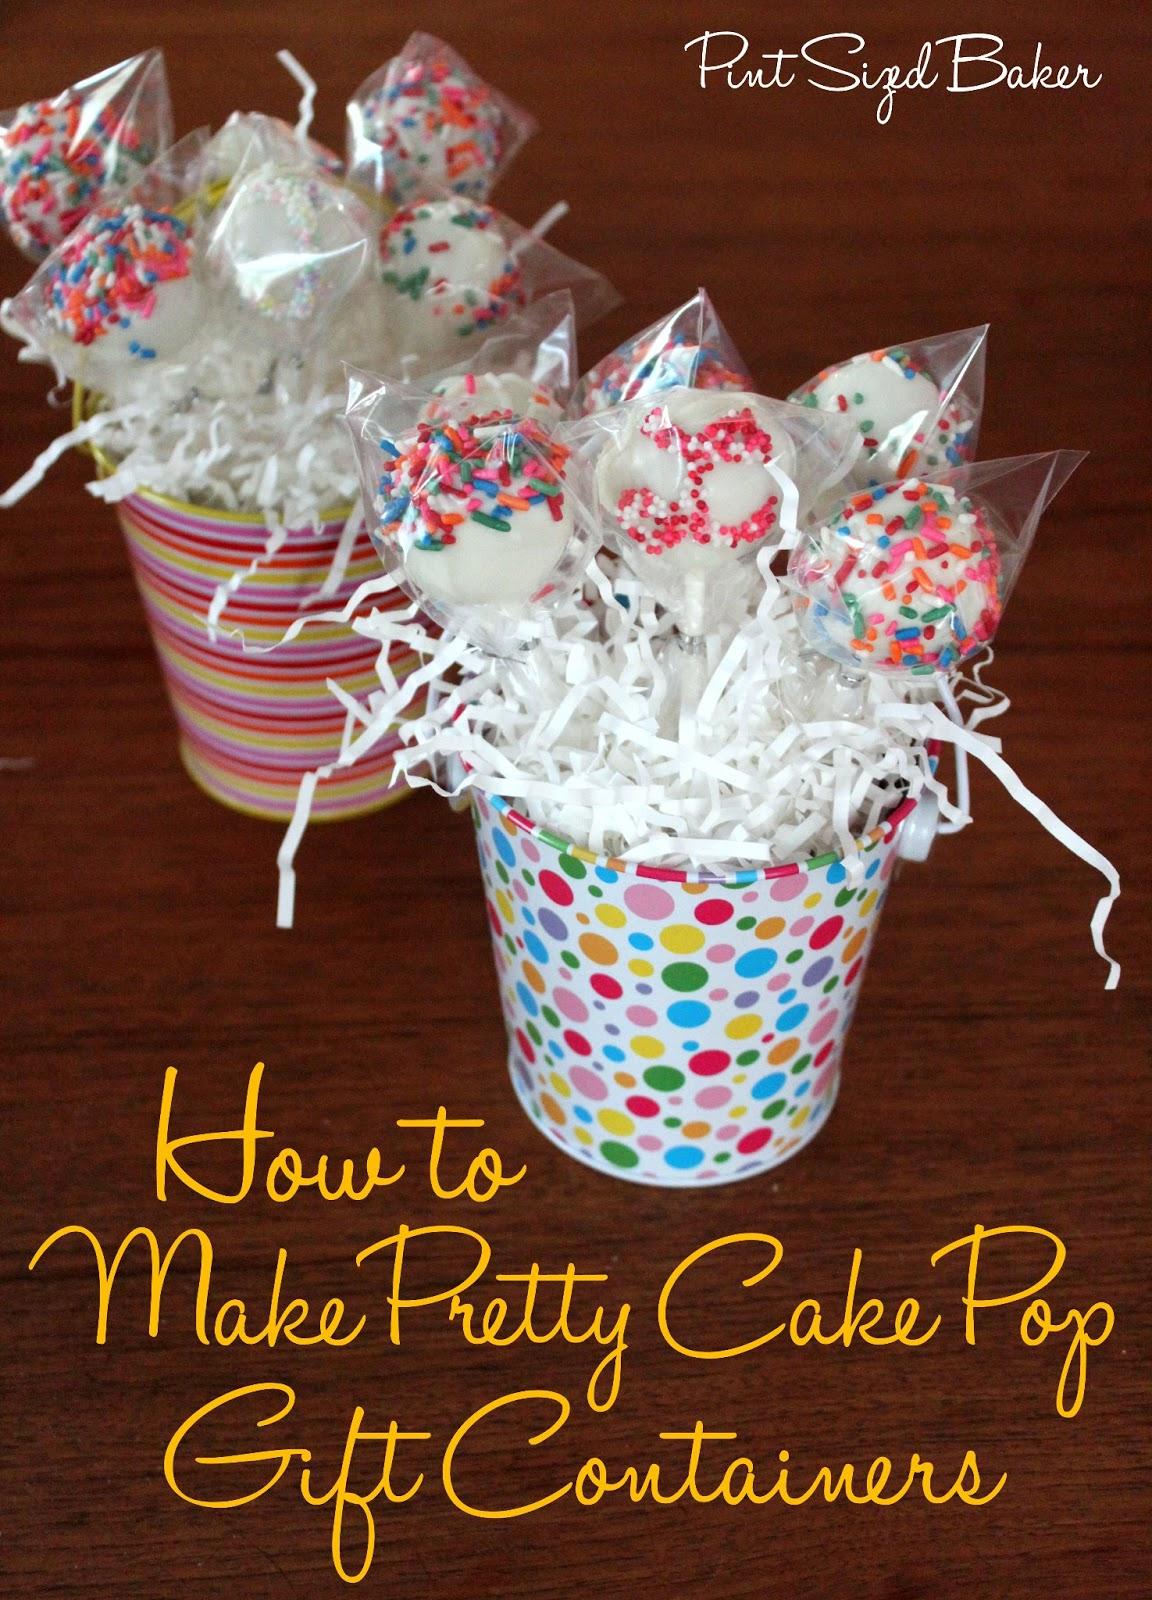 Cake Pop Display Ideas Birthday Http Www Pintsizedbaker Com 2013 01